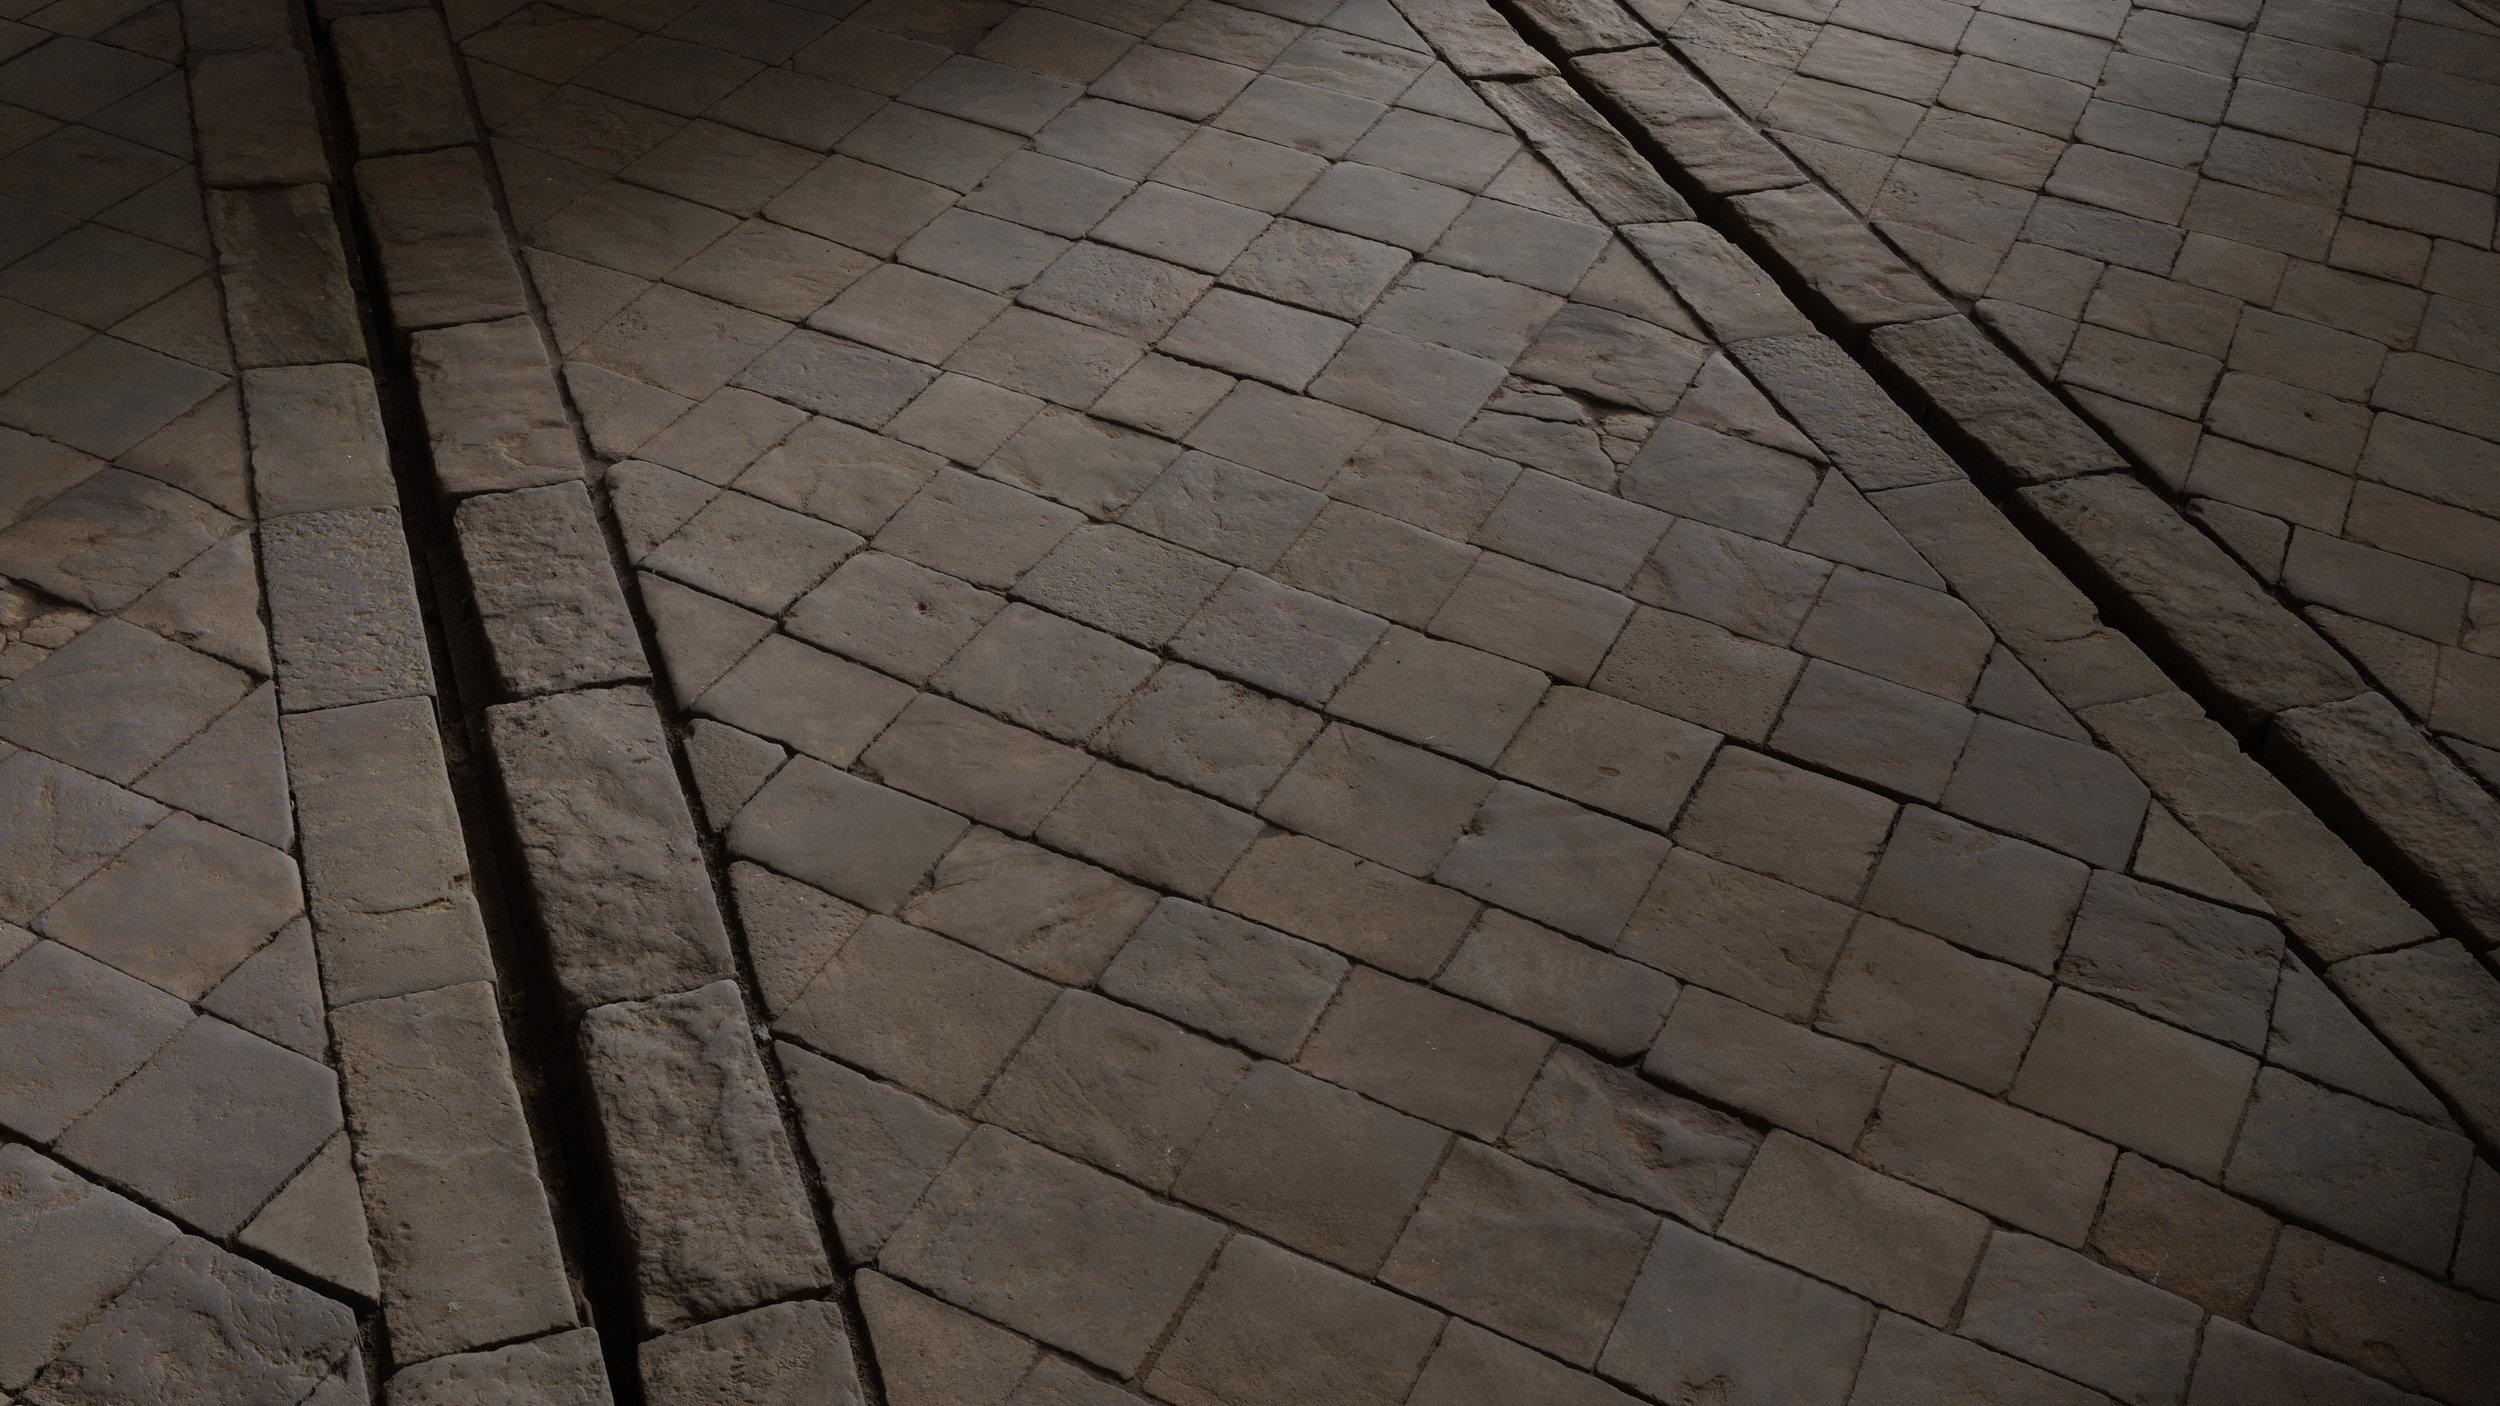 TexturesCom_Medieval_Floor_9_Path_header.jpg